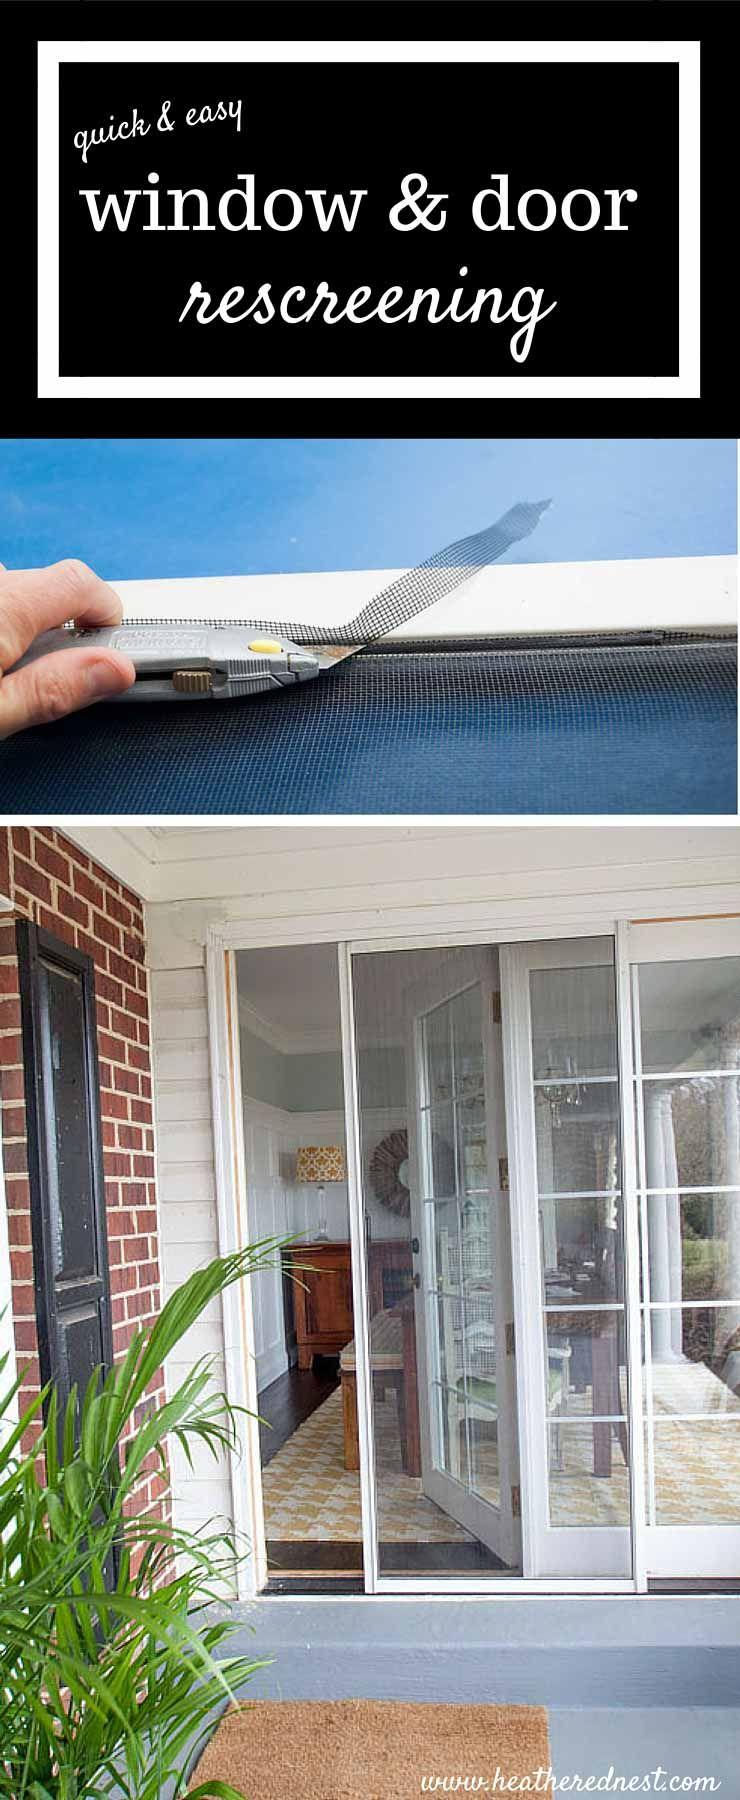 Diy Window Door Rescreening A Simple Way To Save Diy Window Home Improvement Projects Home Repairs